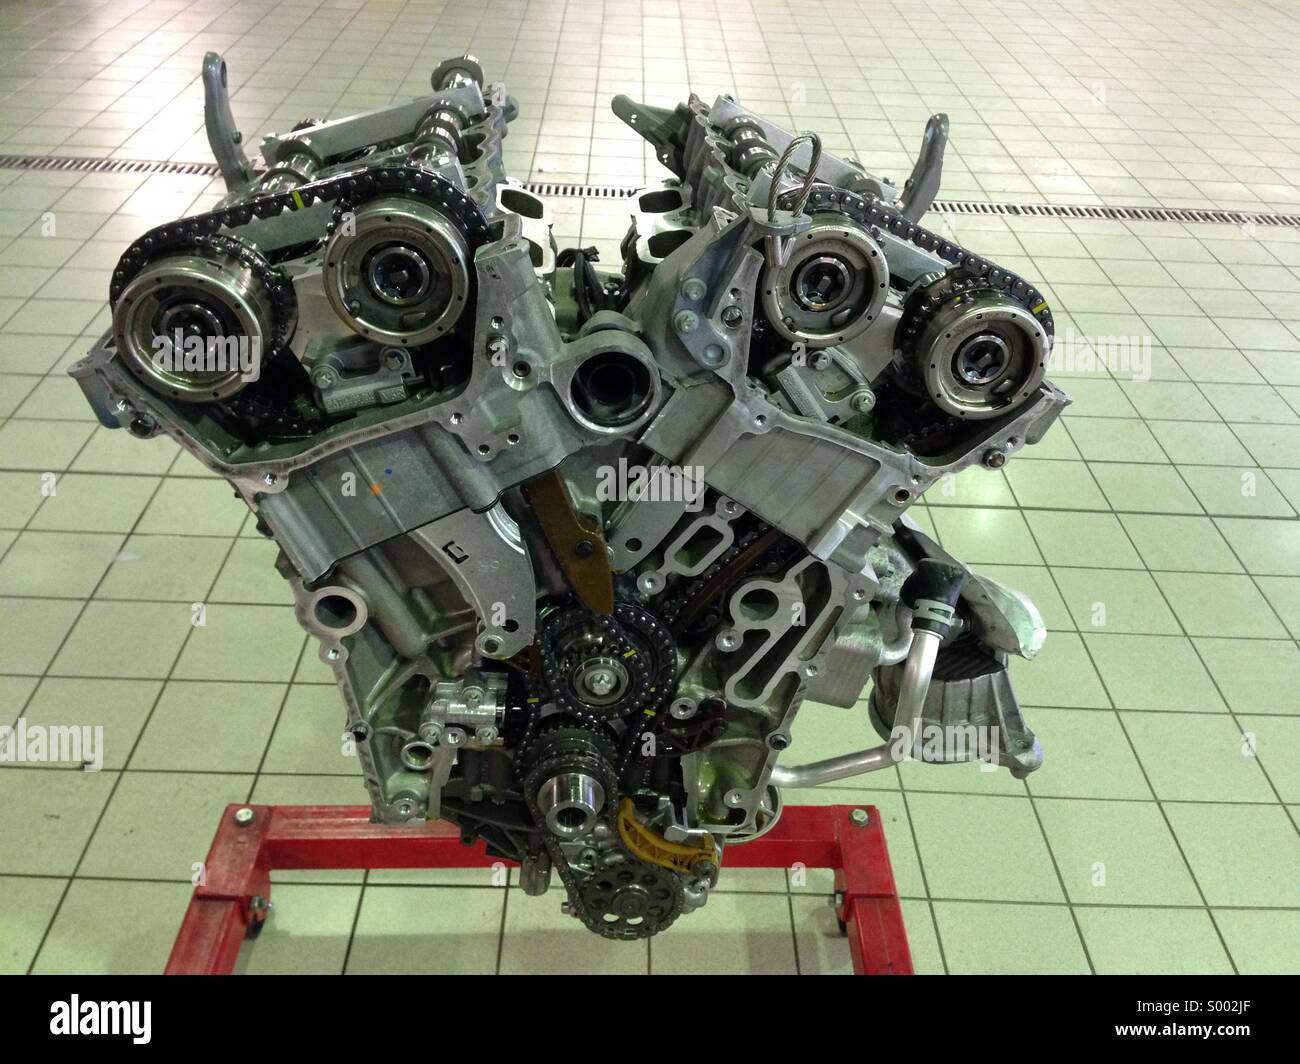 Engine Timing Stockfotos & Engine Timing Bilder - Alamy